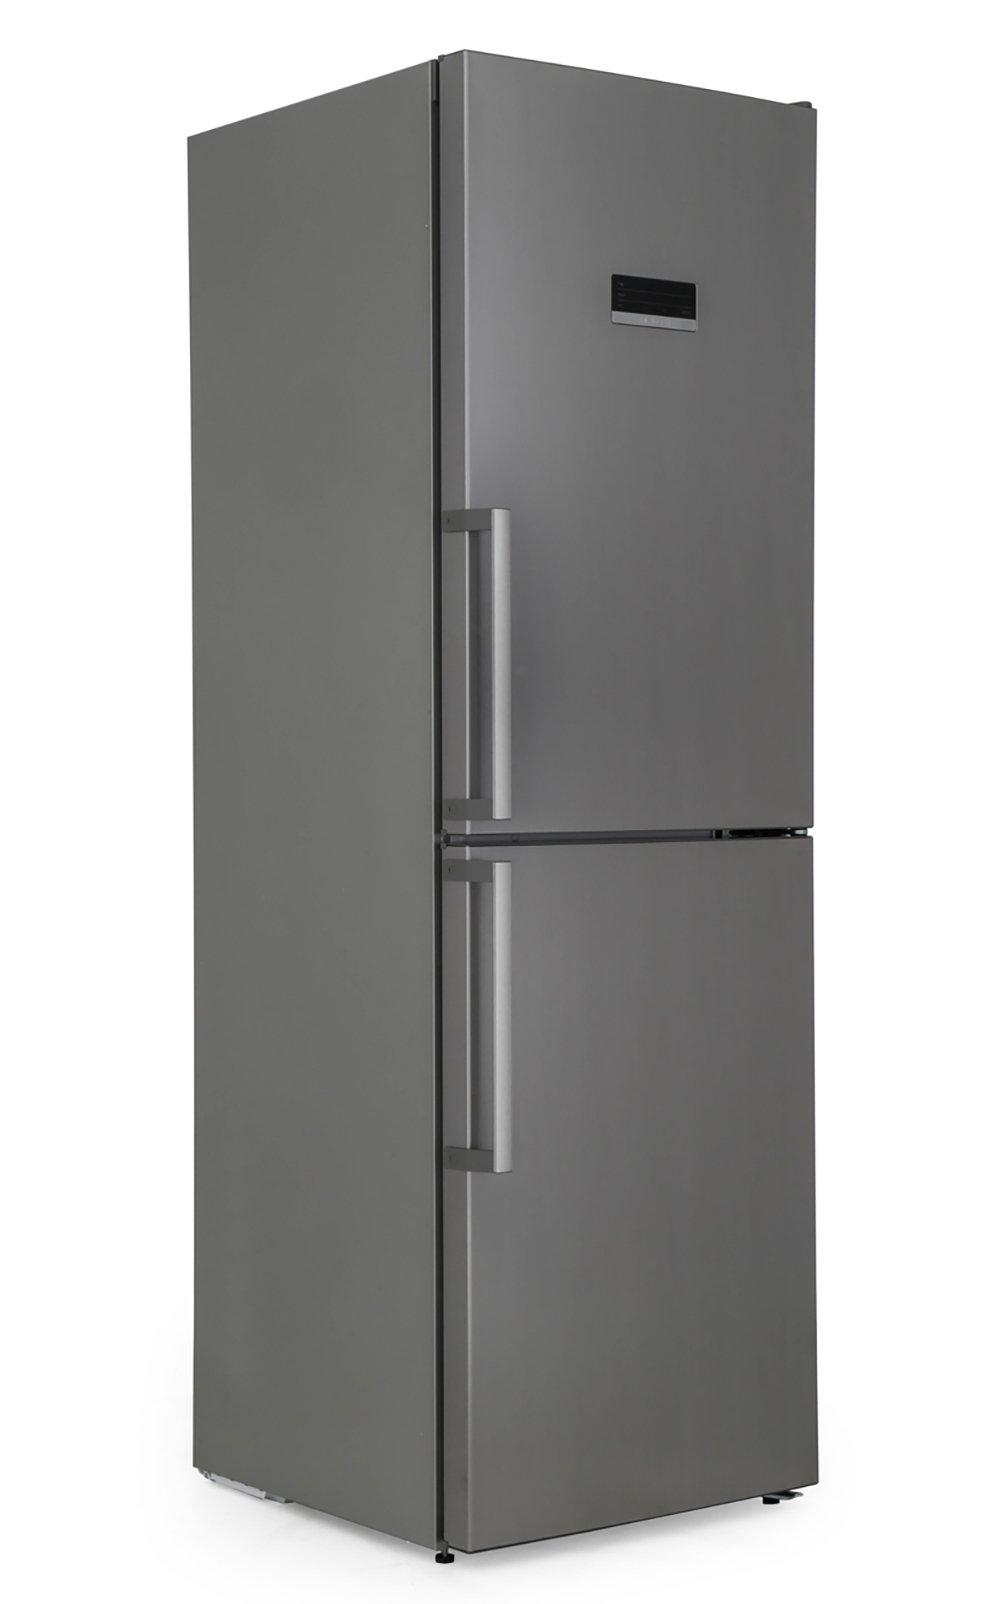 Bosch Serie 4 KGN34XL35G Frost Free Fridge Freezer